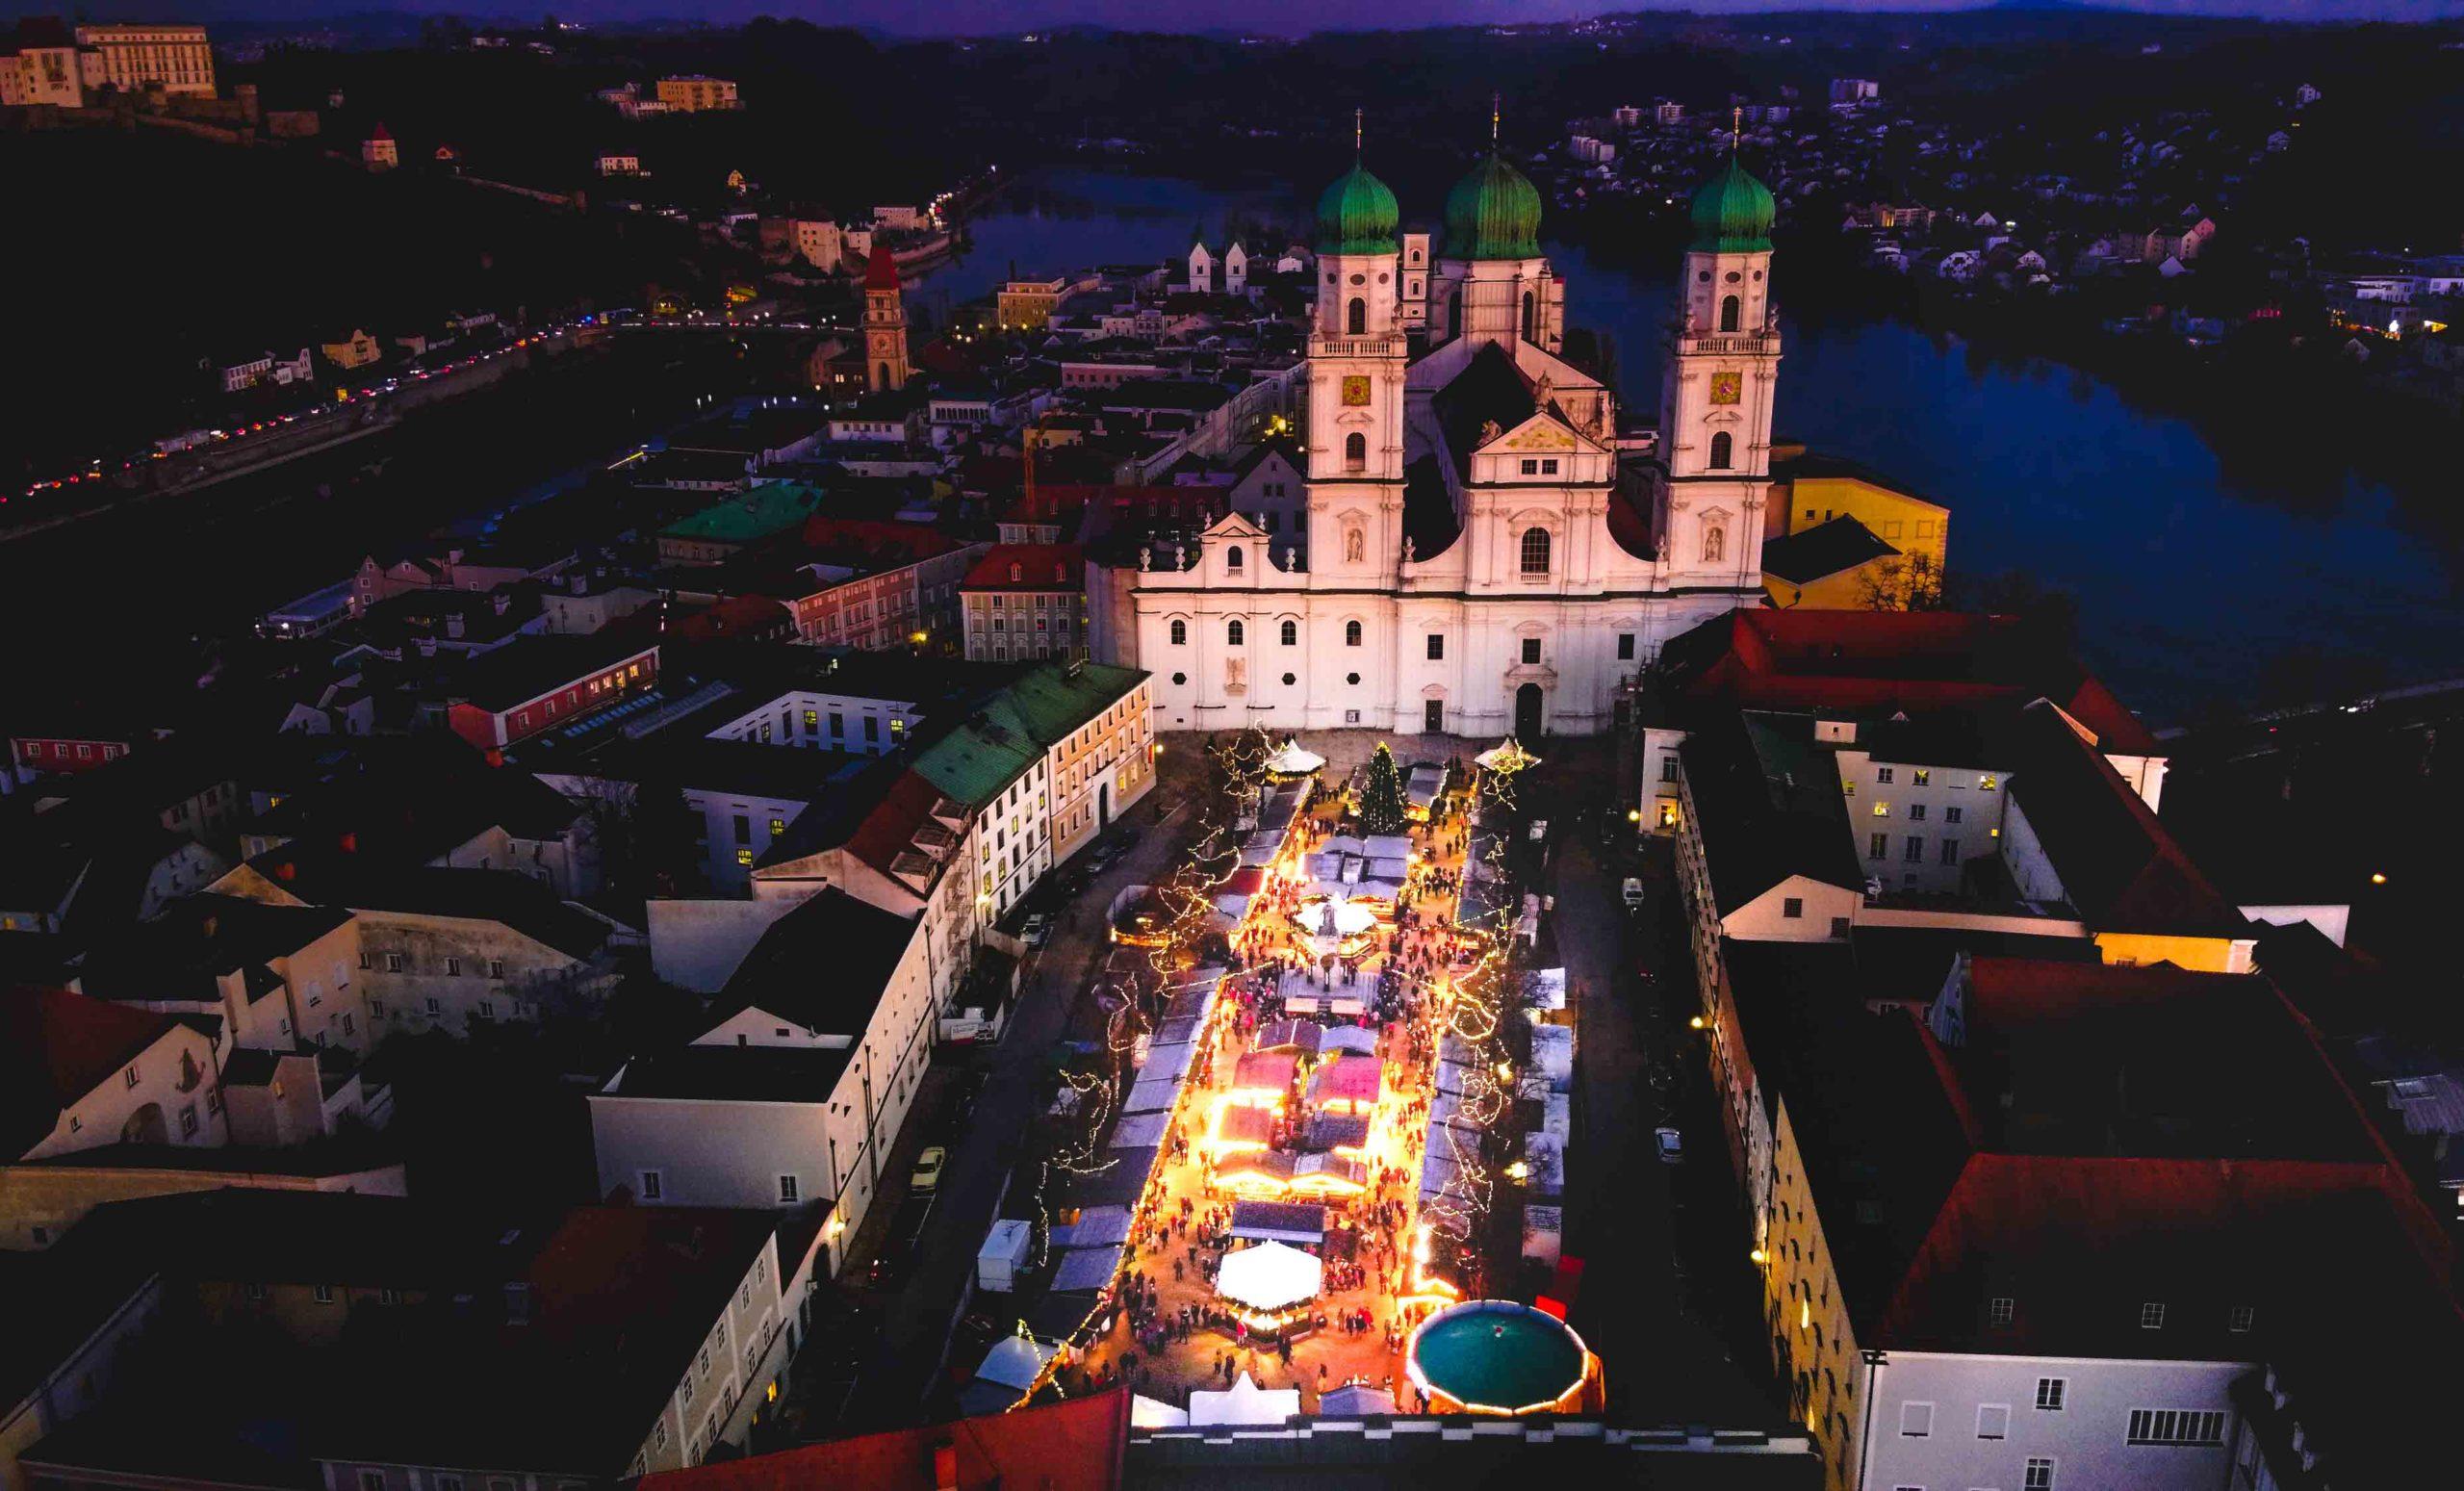 Christkindlmarkt Passau